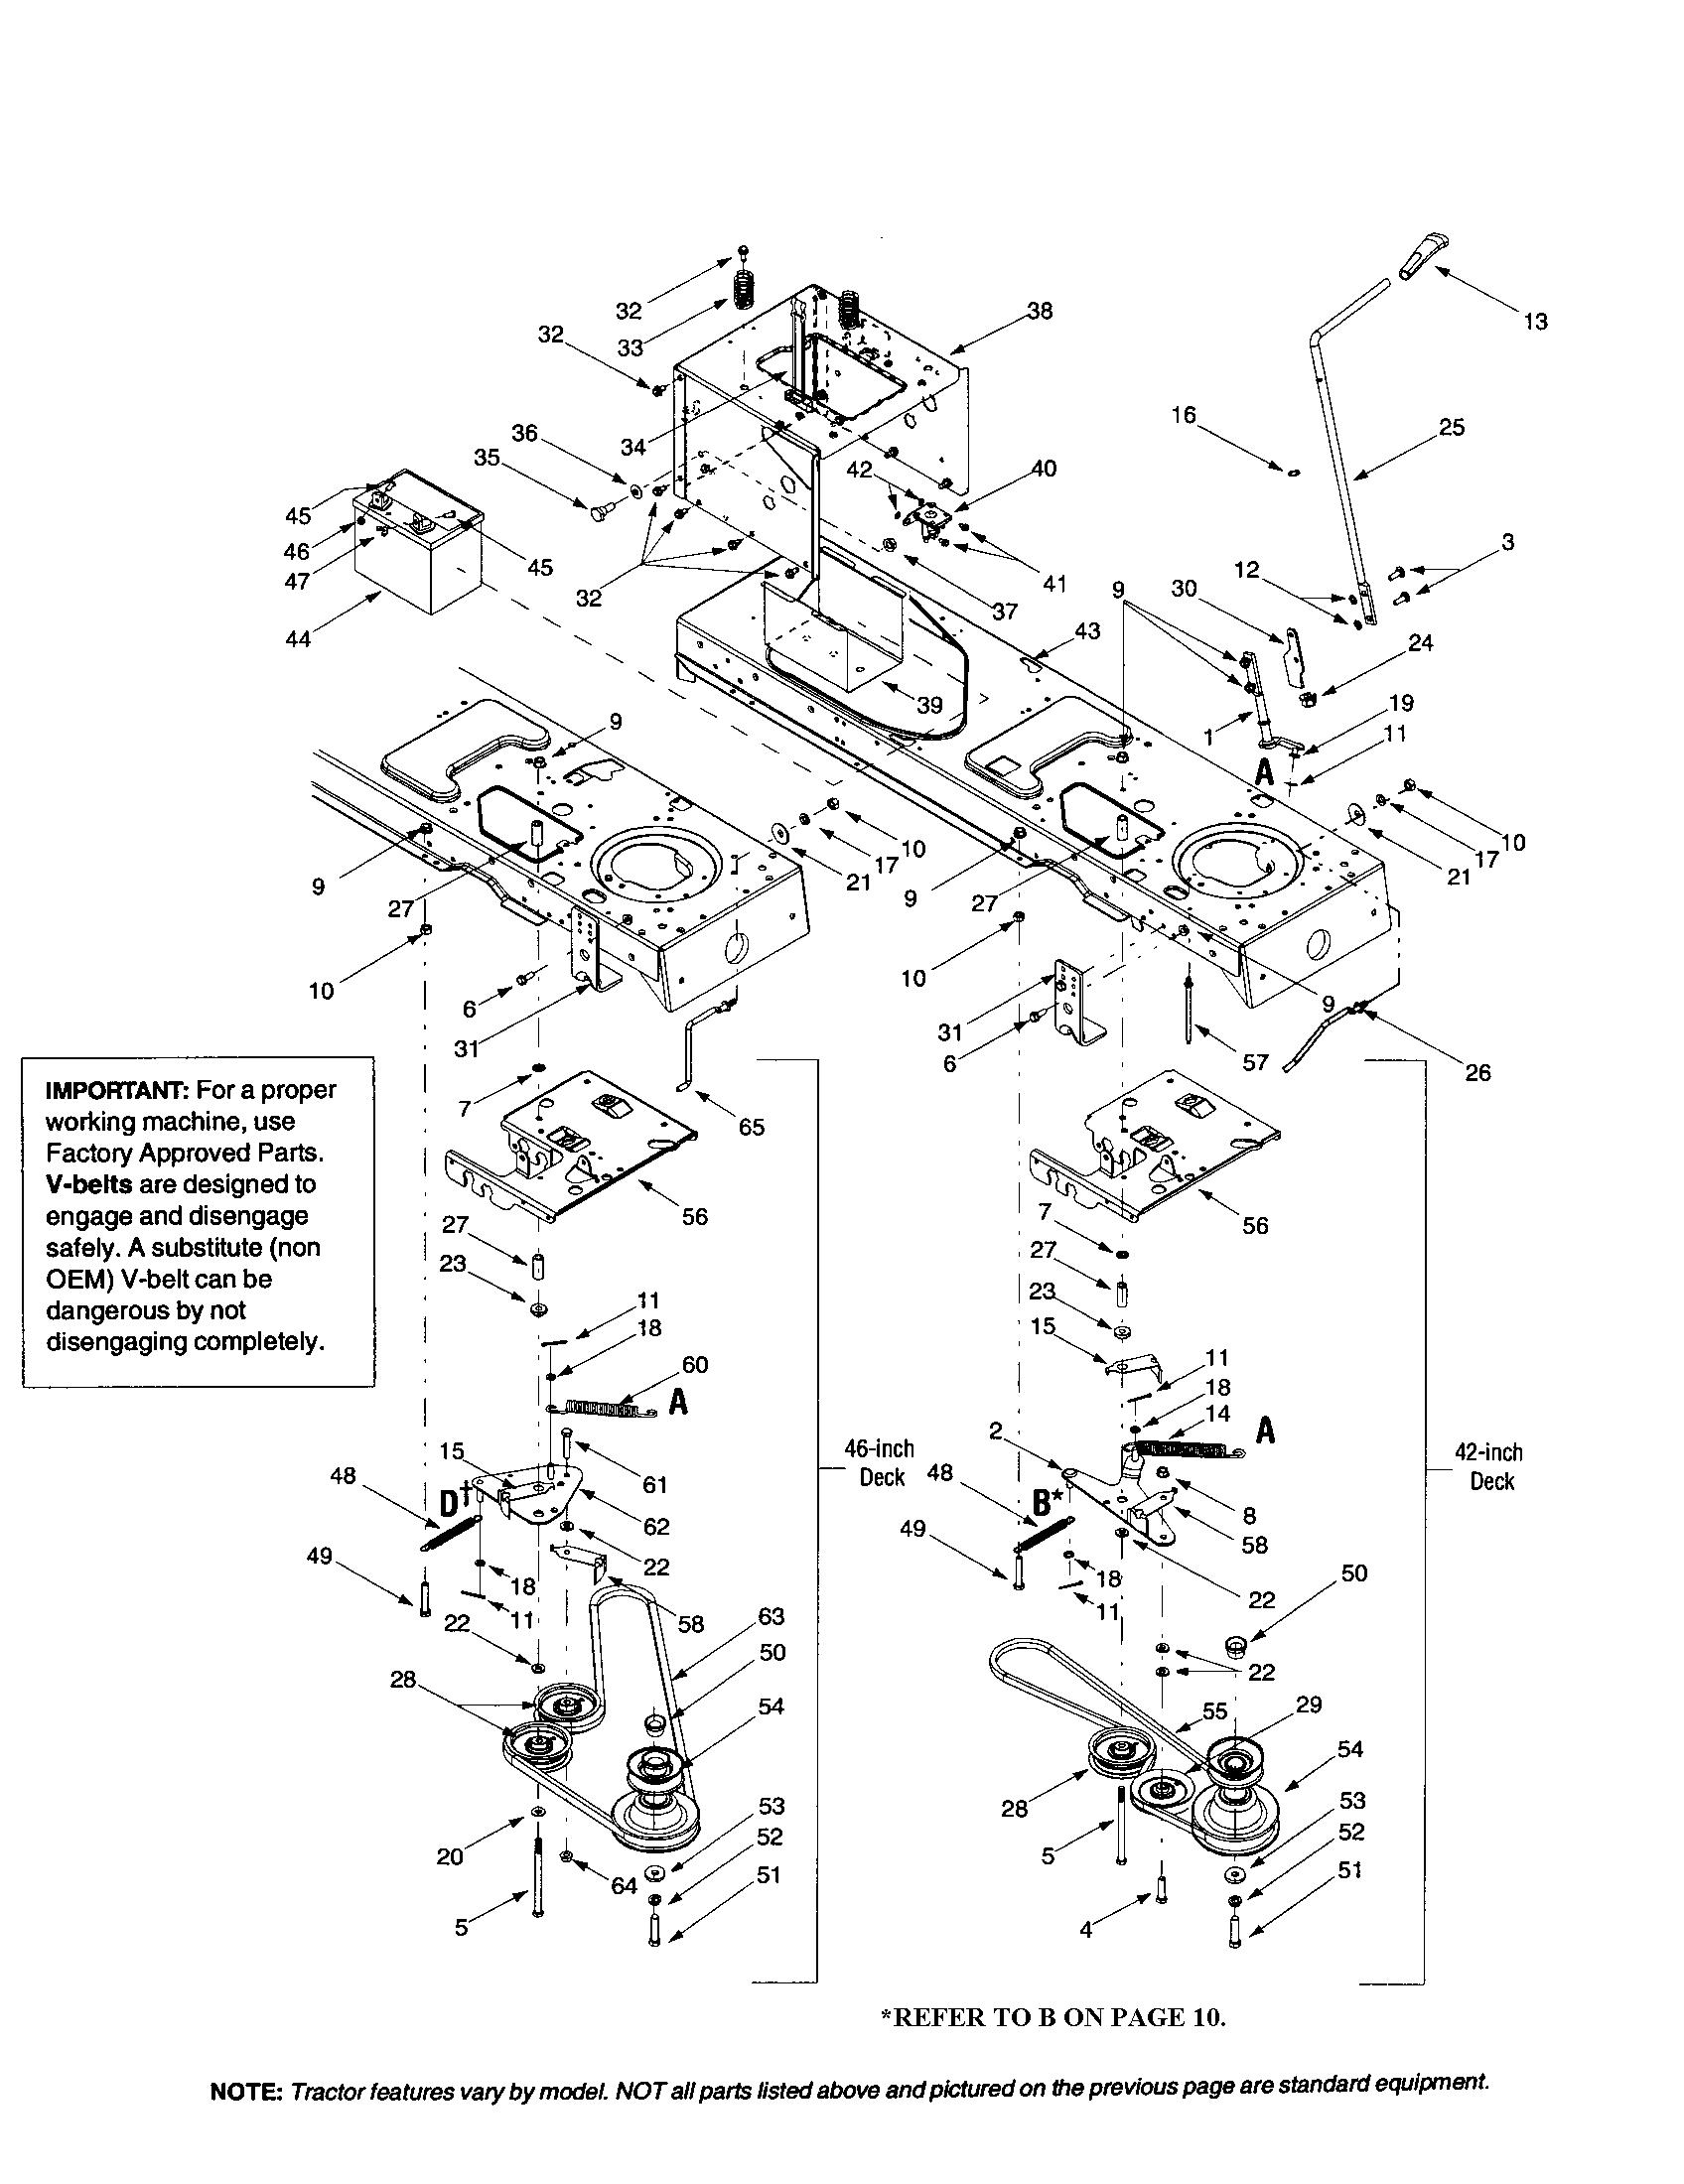 leviton 5601 wiring diagram